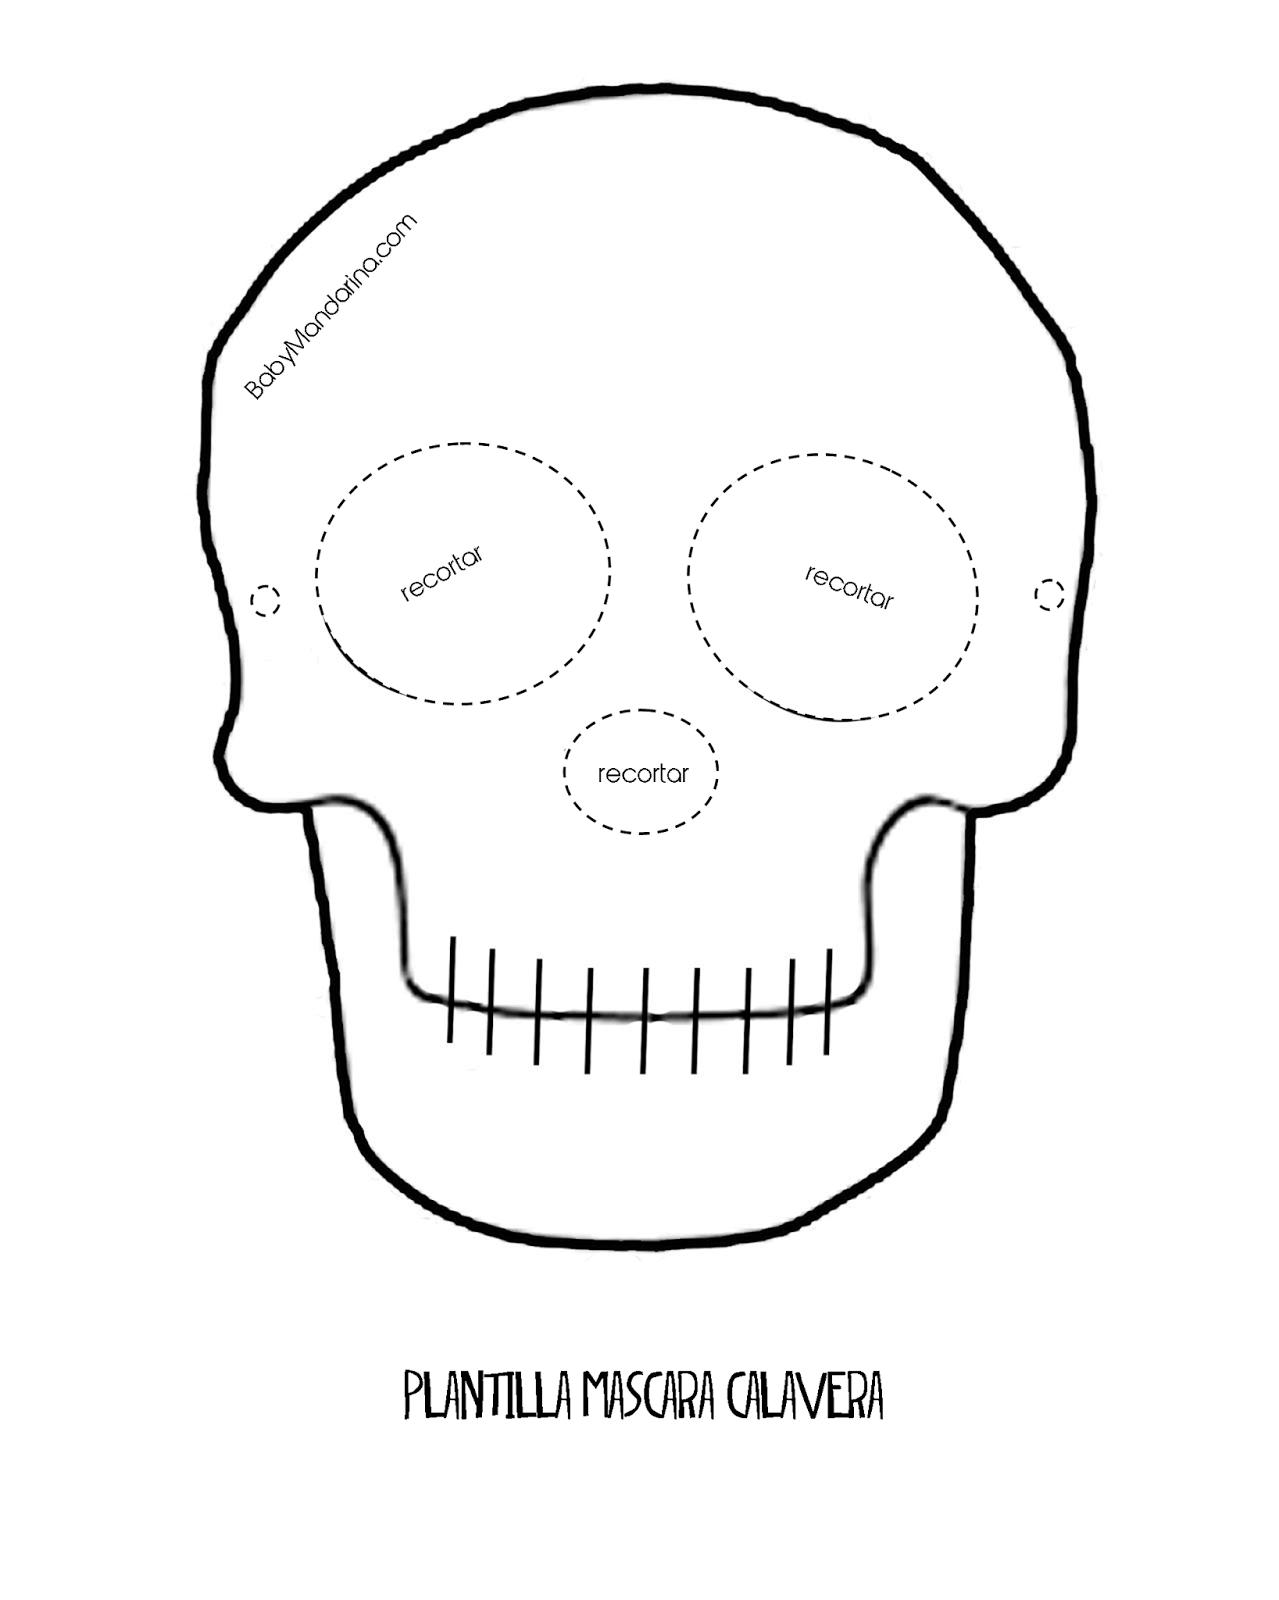 Moderno Plantilla De Máscara De Panda Modelo - Ejemplo De Colección ...